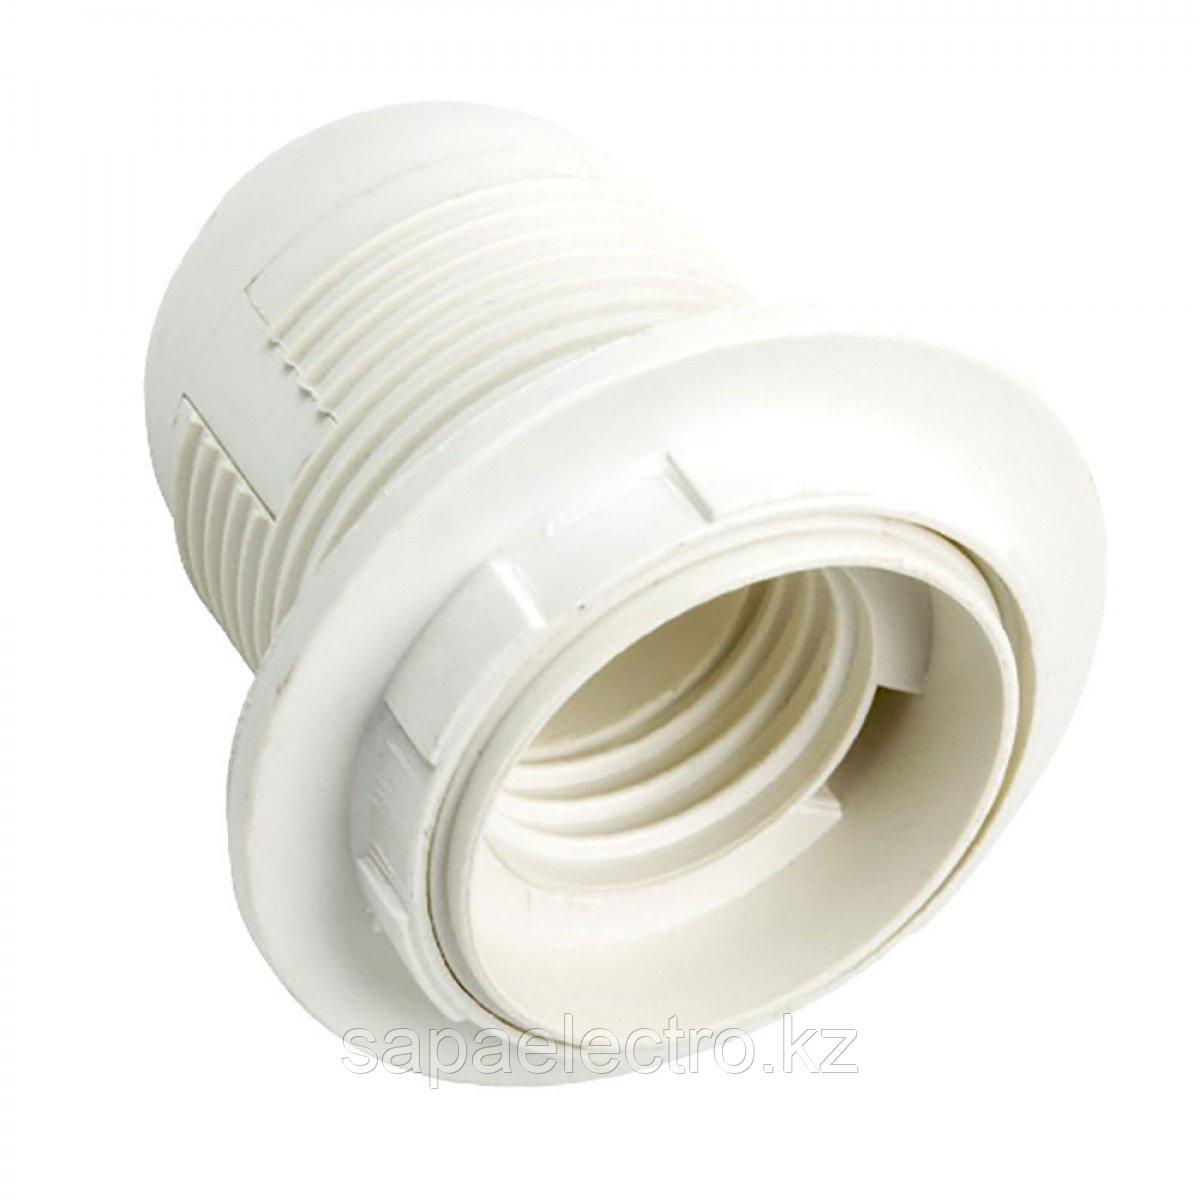 Кольцо с резьбой для подв.патрона E27 (TS) (250шт)